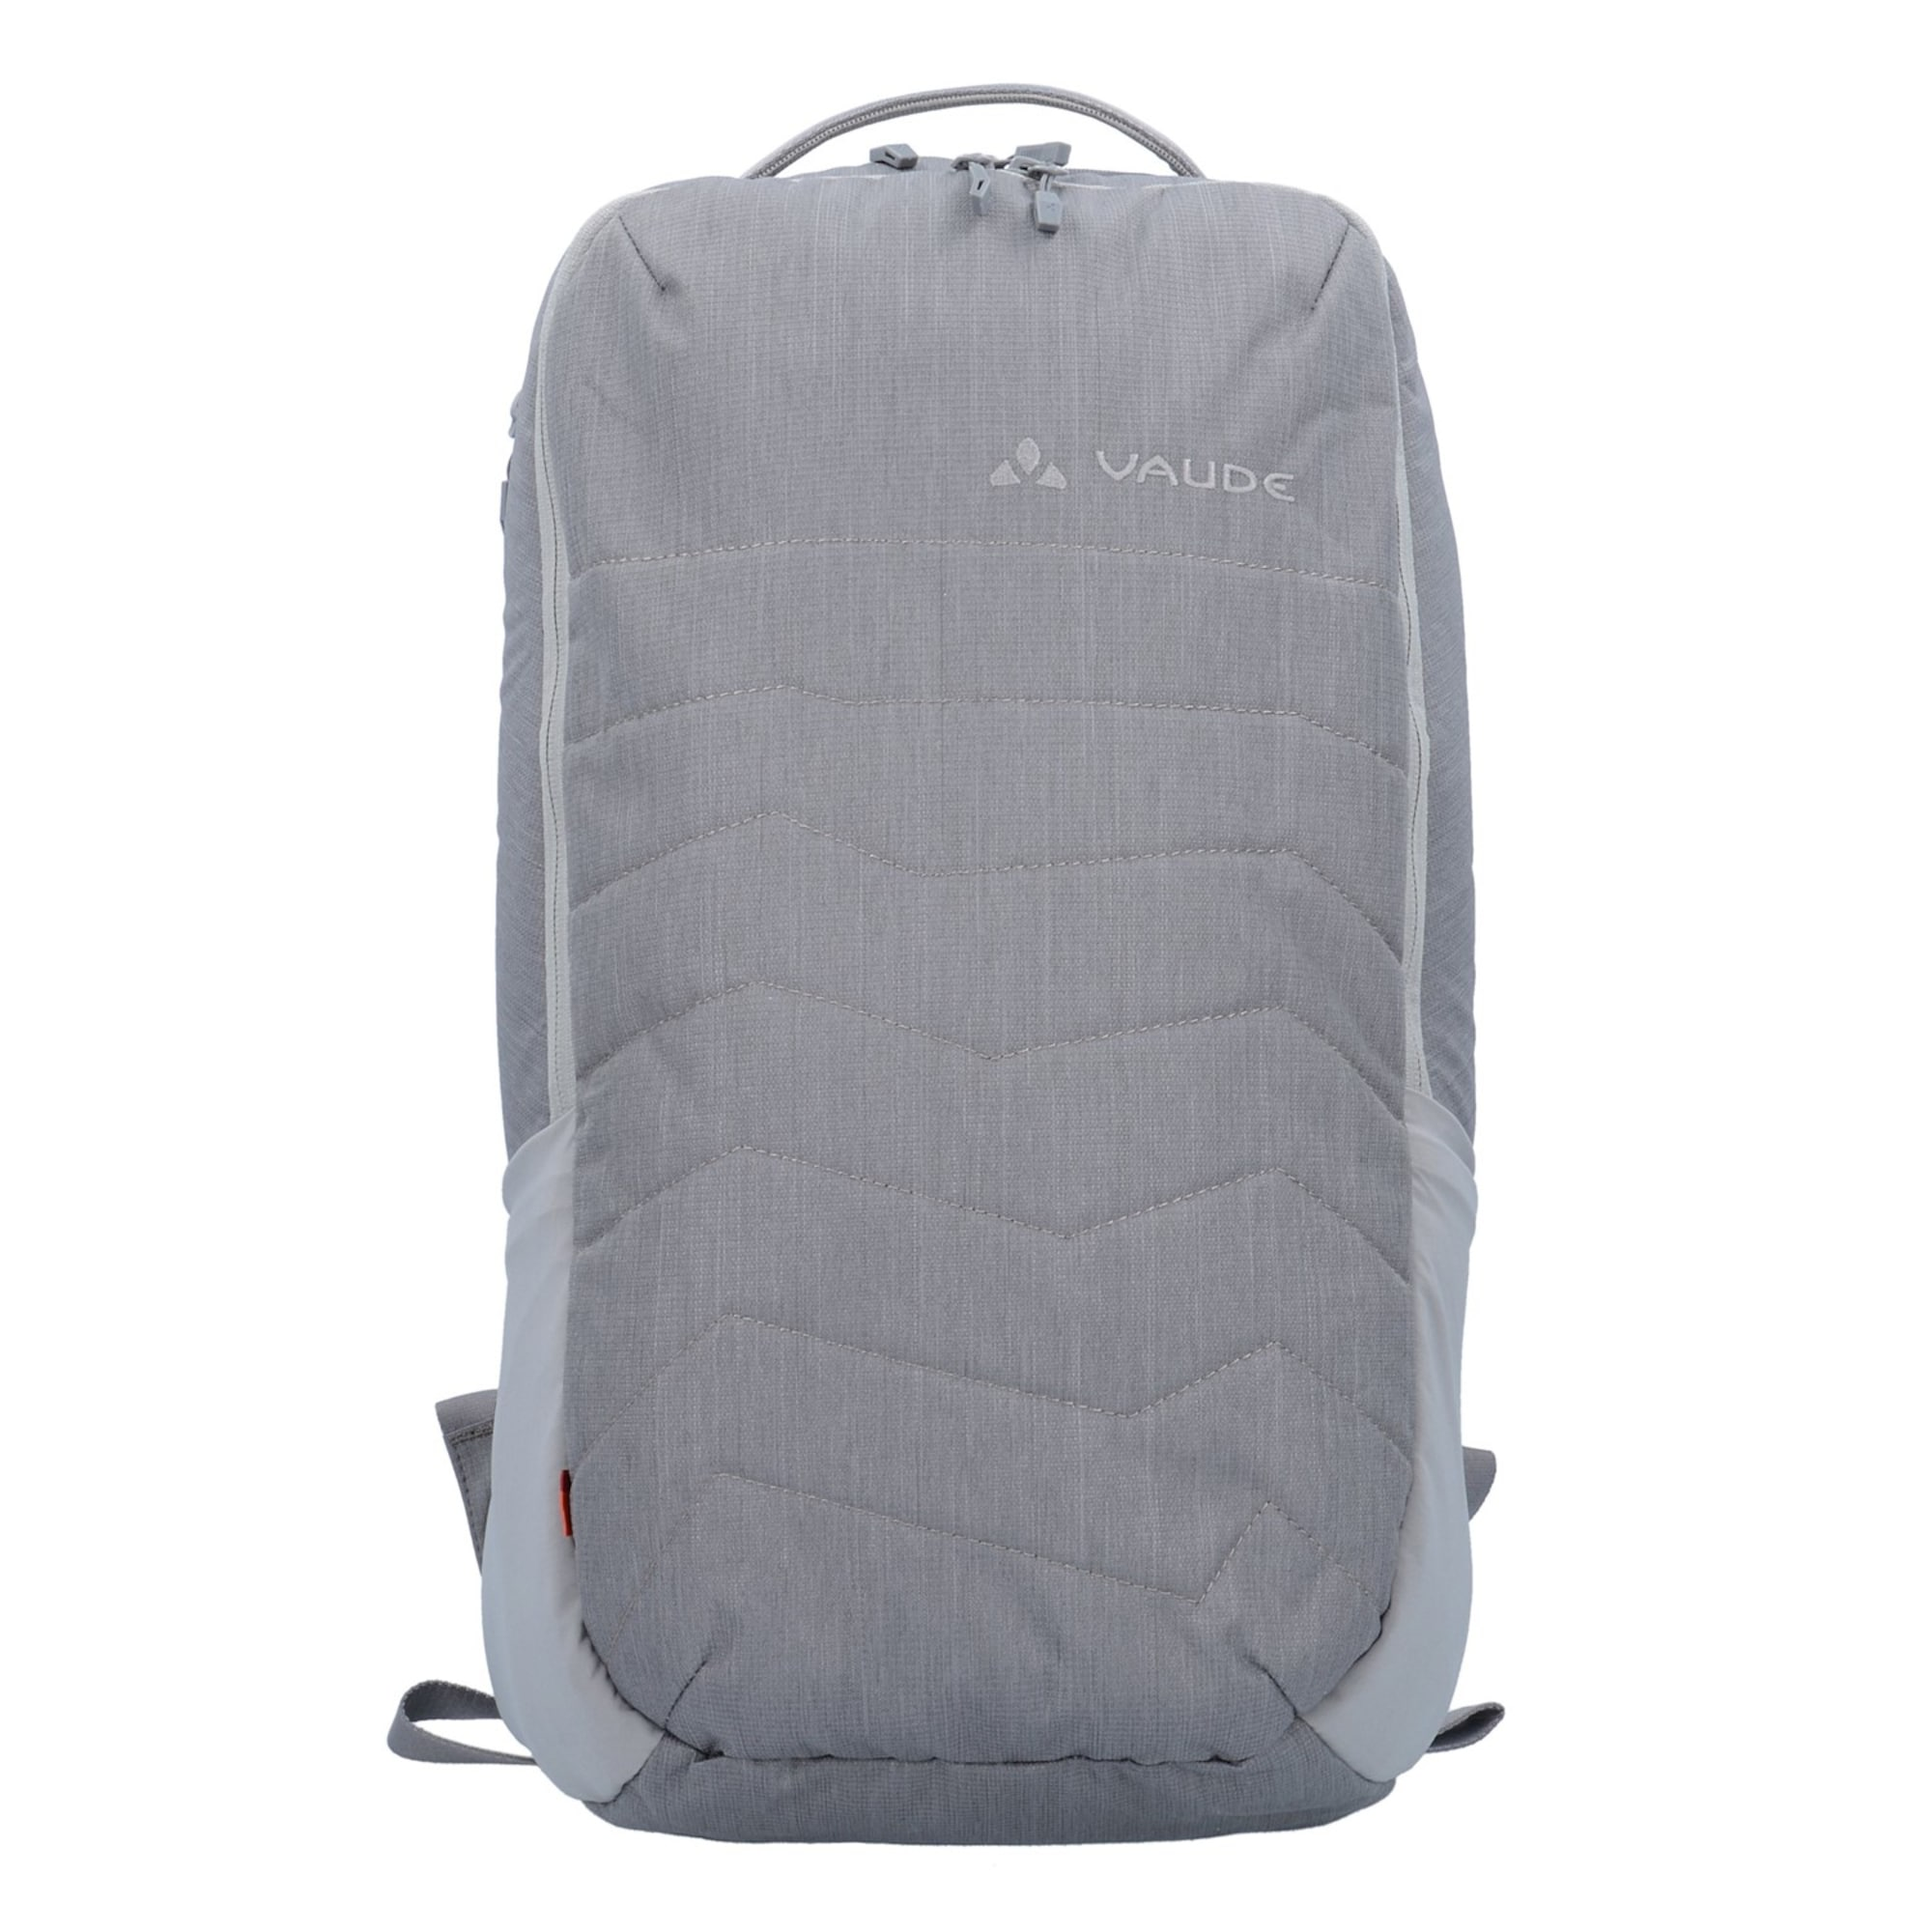 'PETAIR' Daypack   Taschen > Rucksäcke > Tagesrucksäcke   Vaude